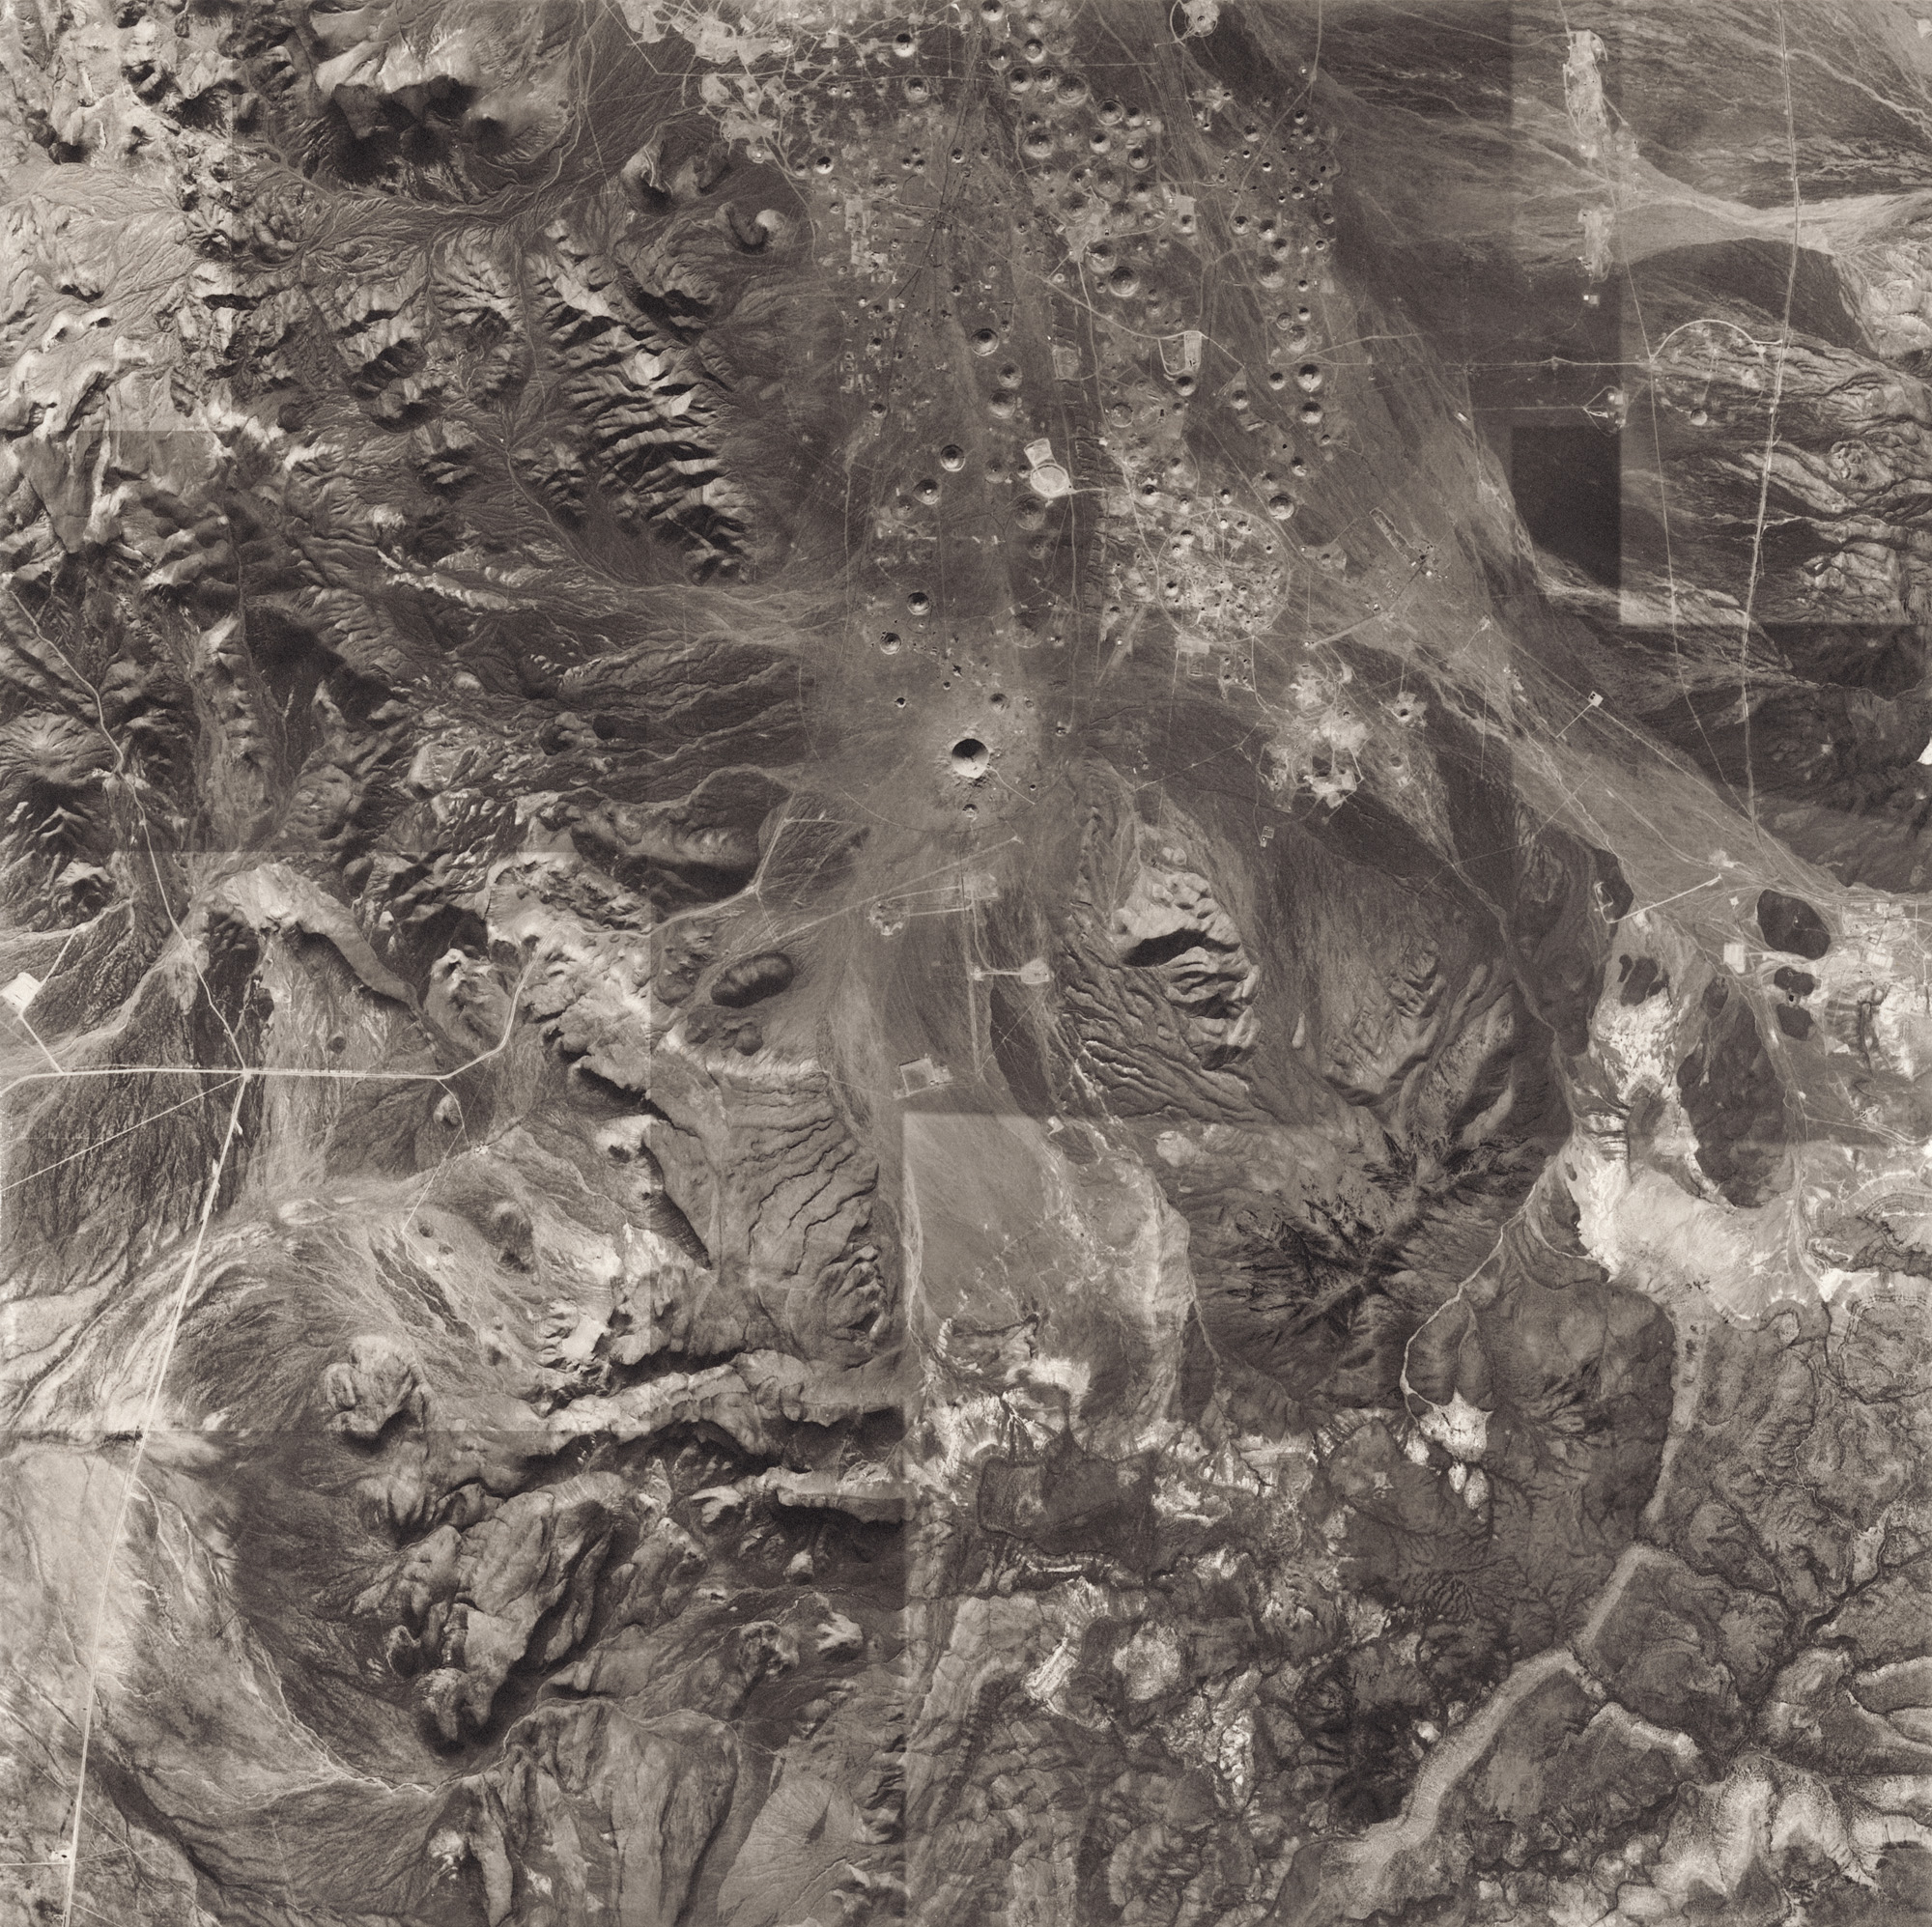 Nevada Test Site, 2008